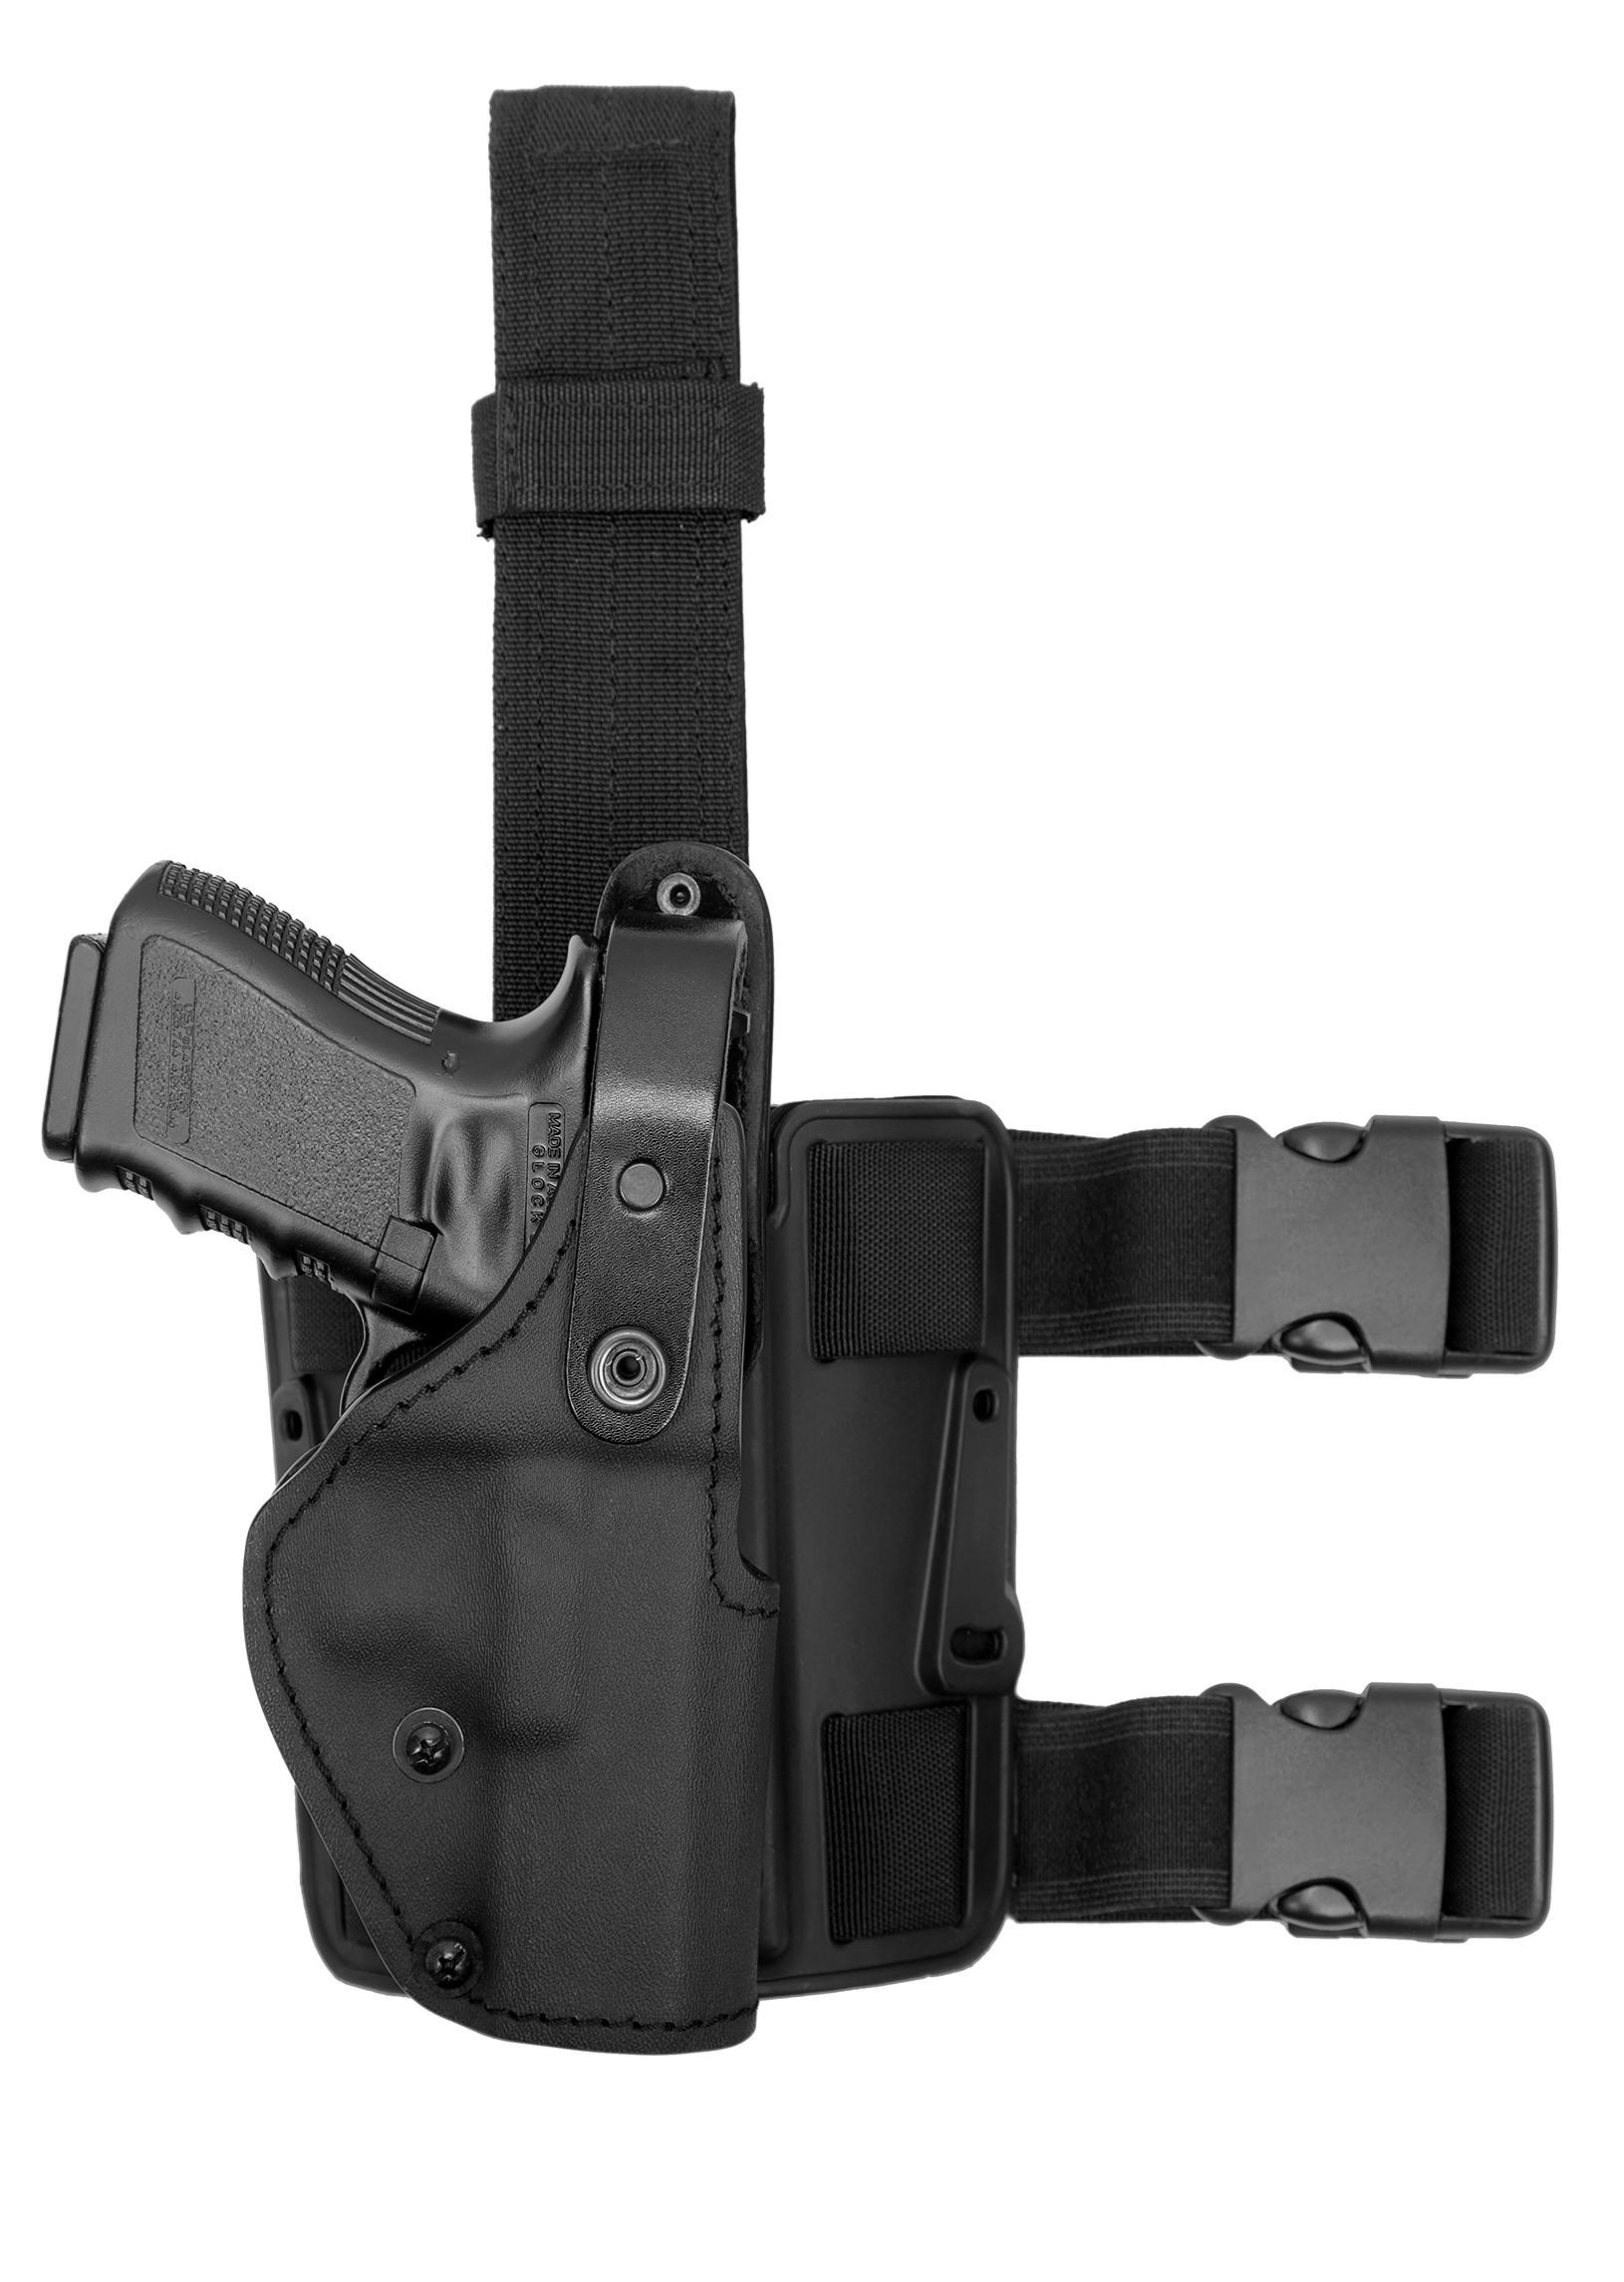 Thumb-break Kydex Tactical Holster - Level II